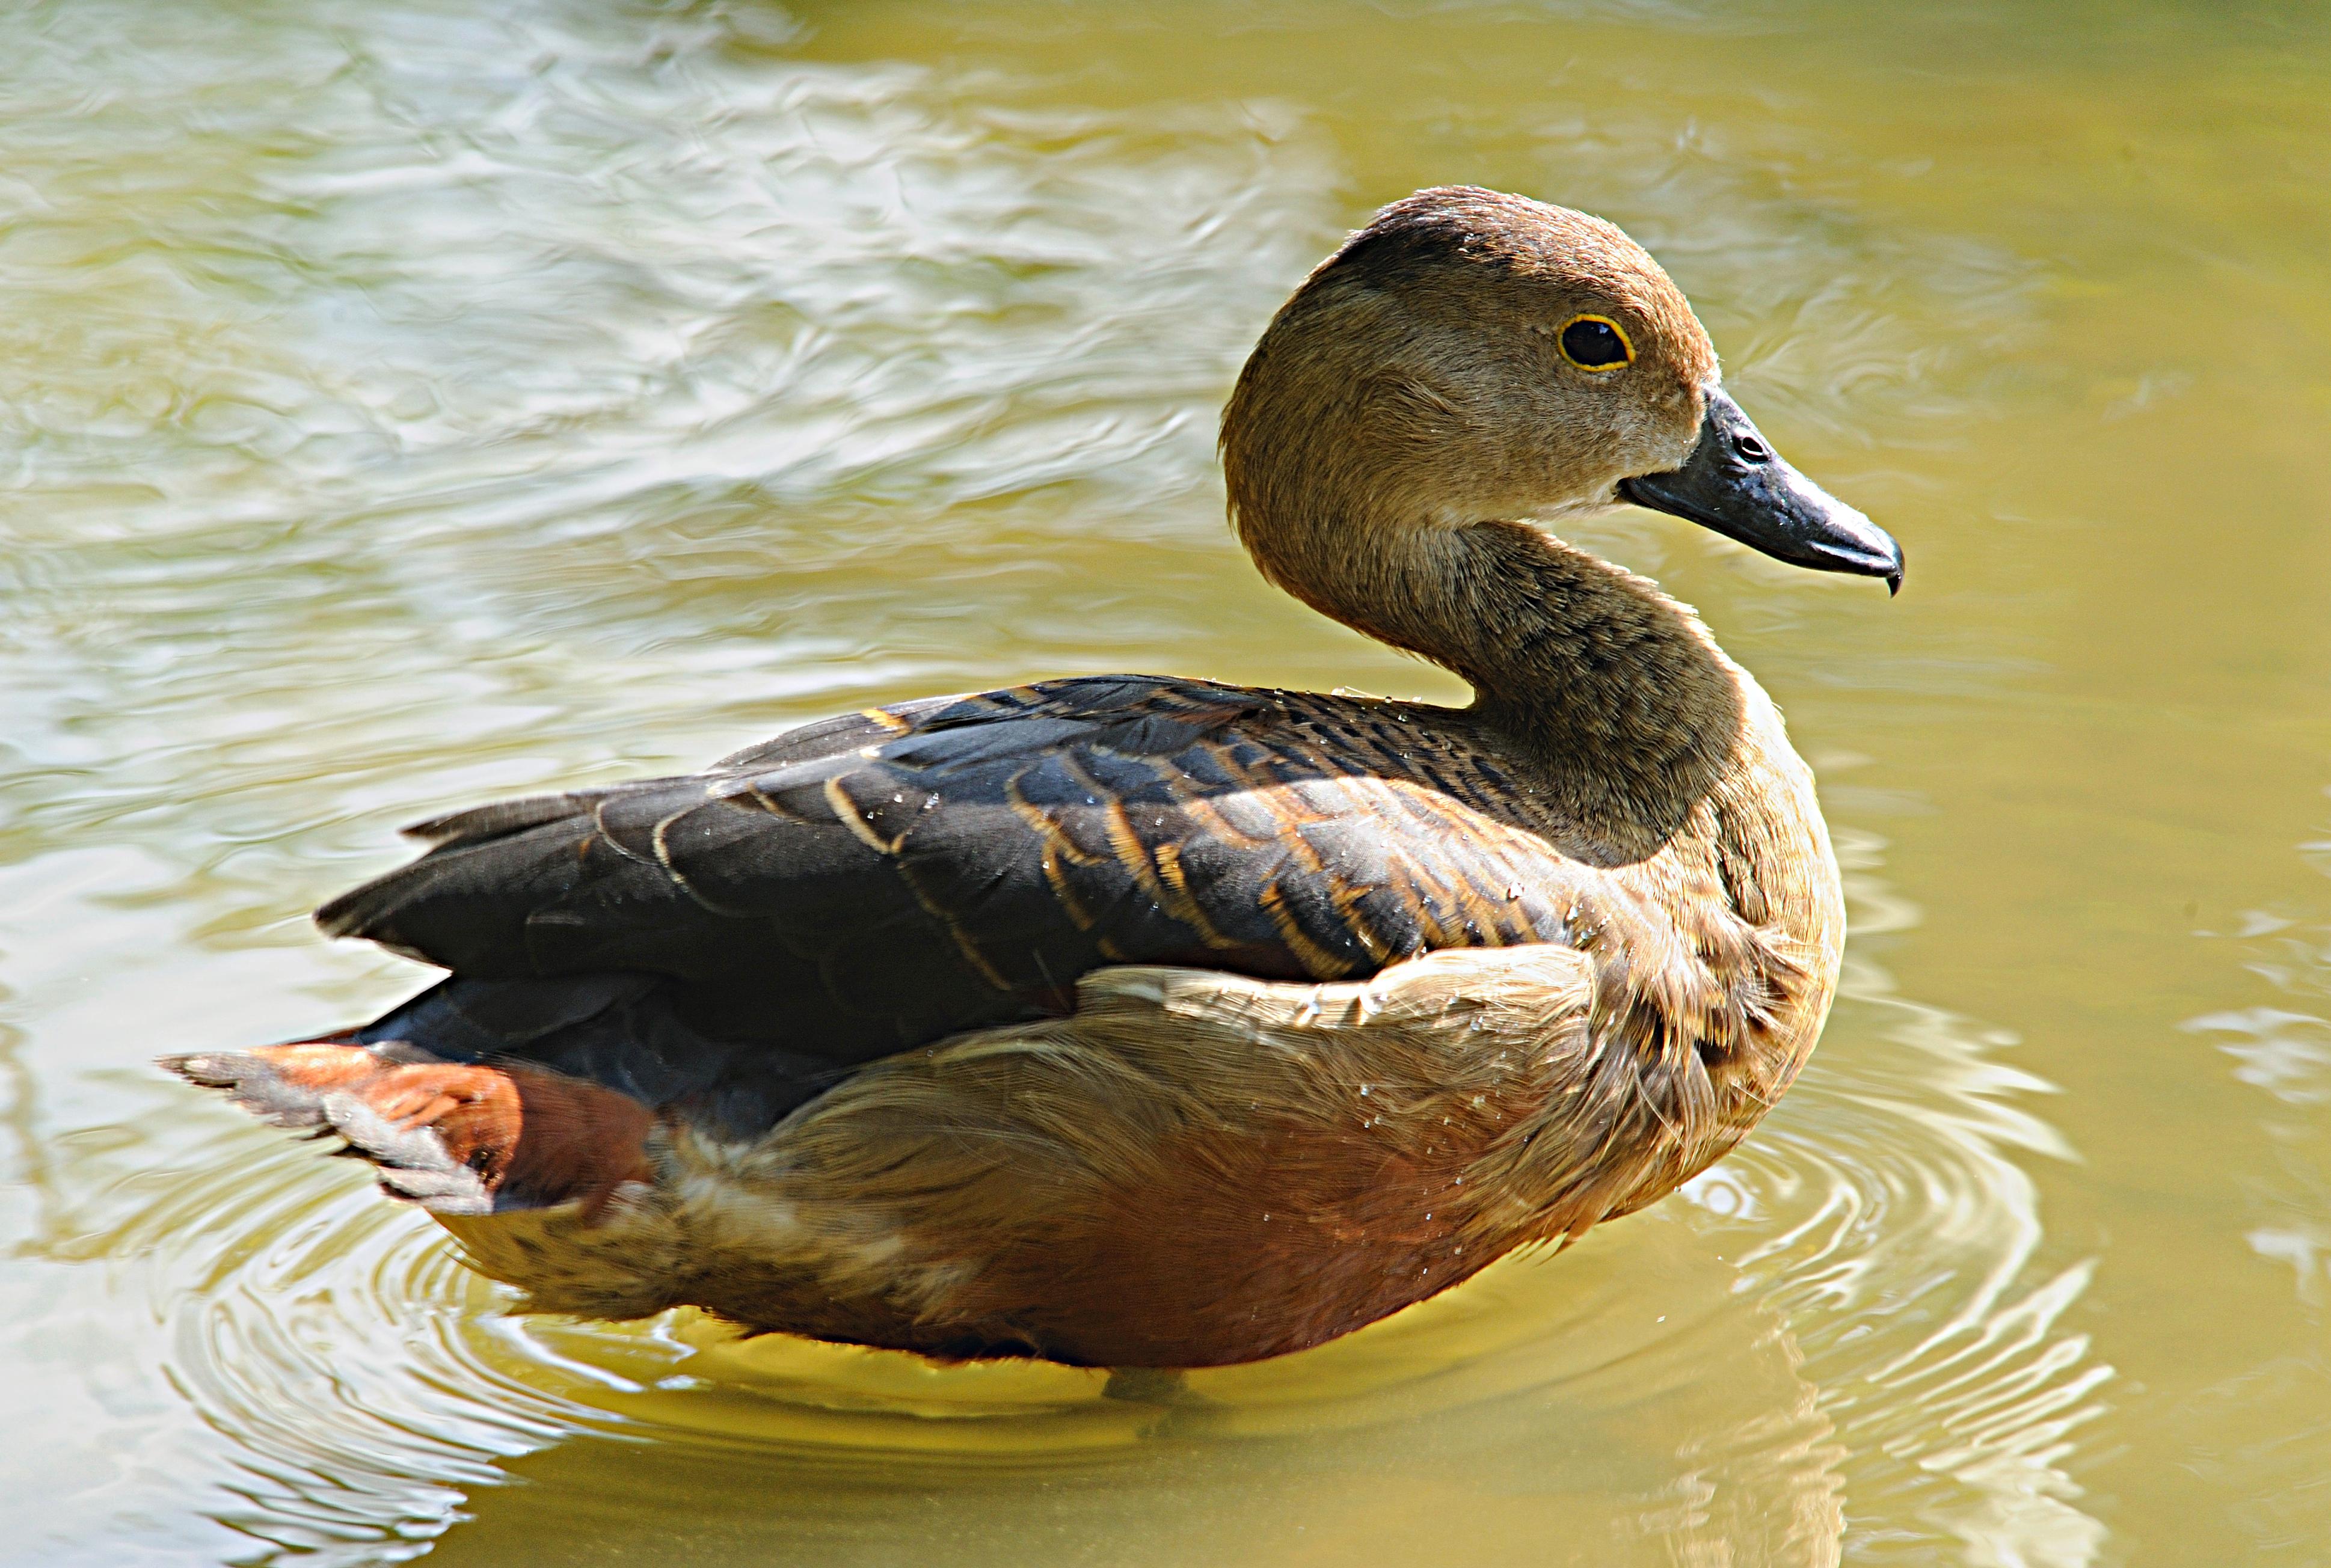 Lesser Whistling Duck, scientific name Dendrocygna javanica